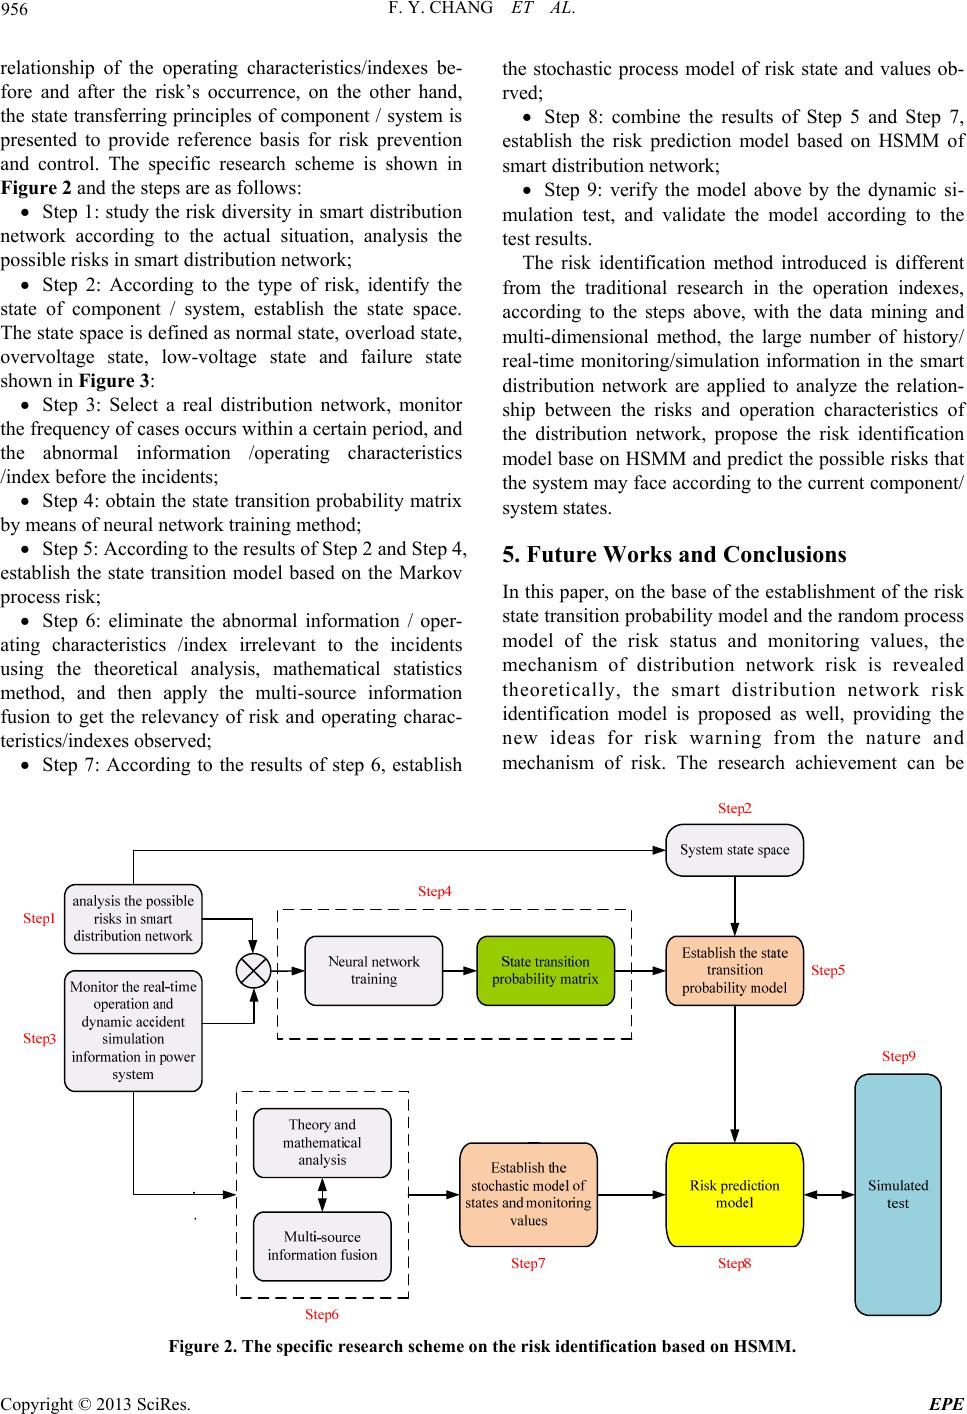 download matrix algebra theory, computations, and